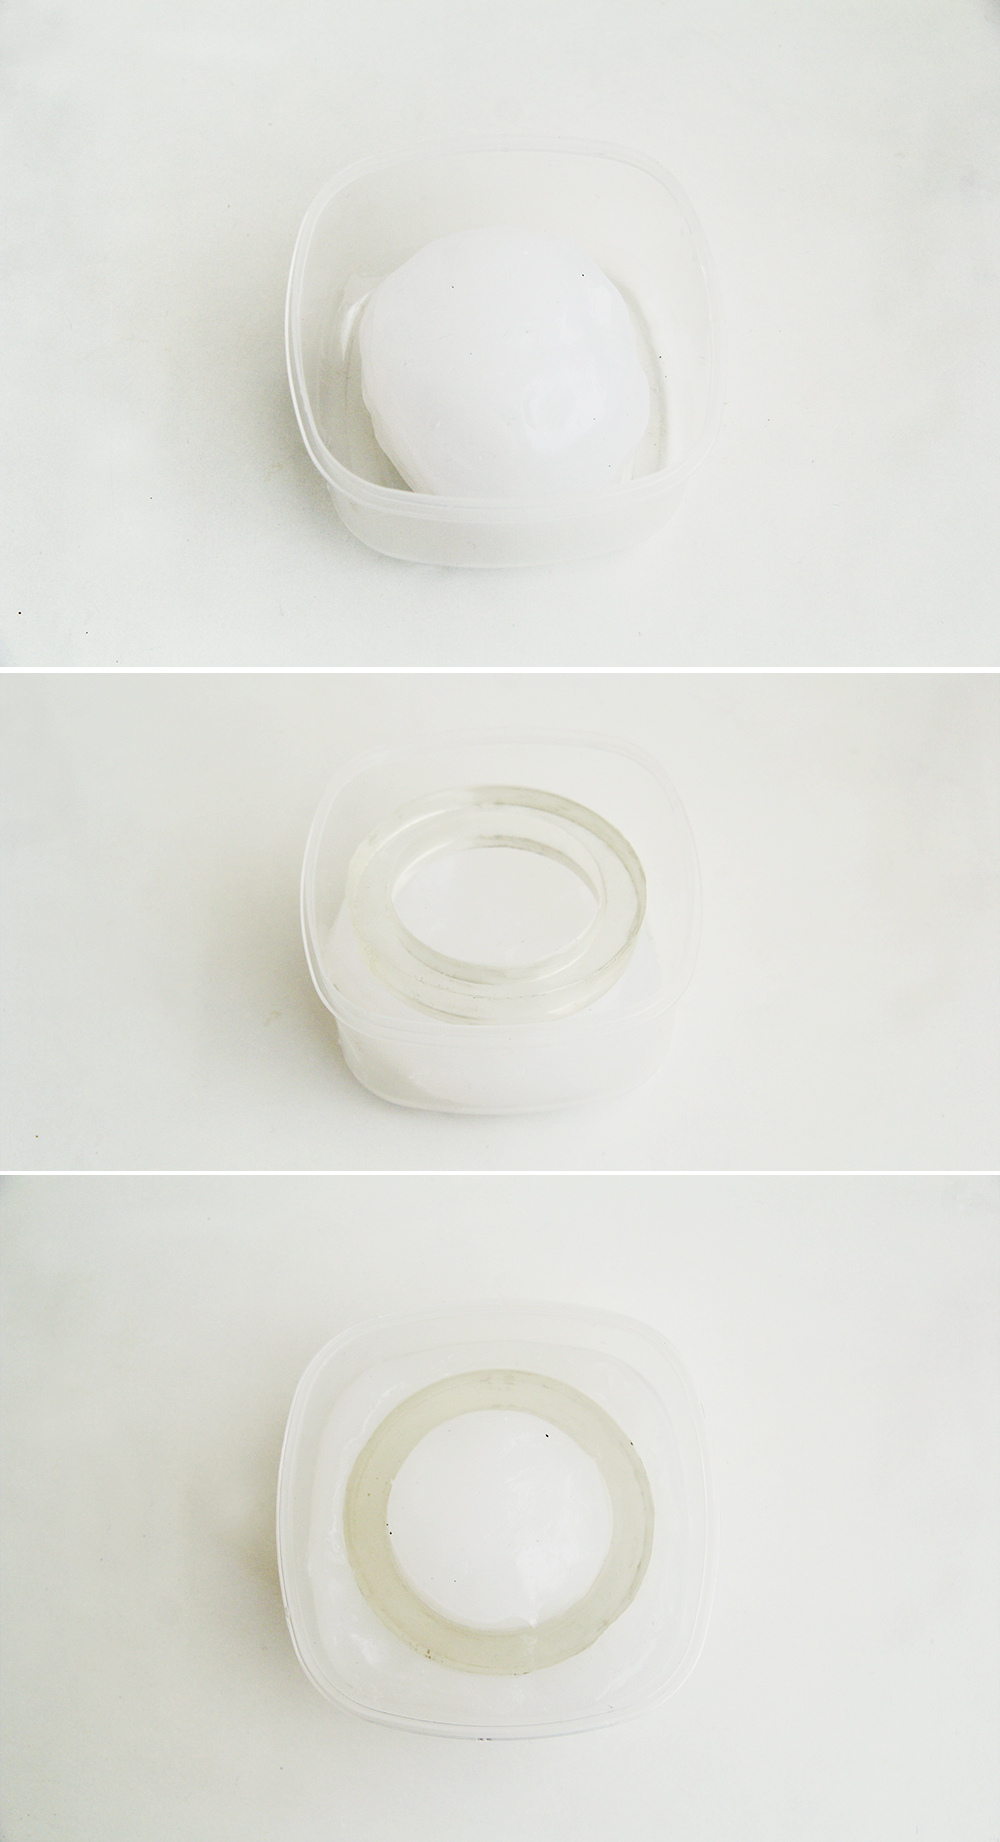 DIY Silicone Mould | @fallfordiy